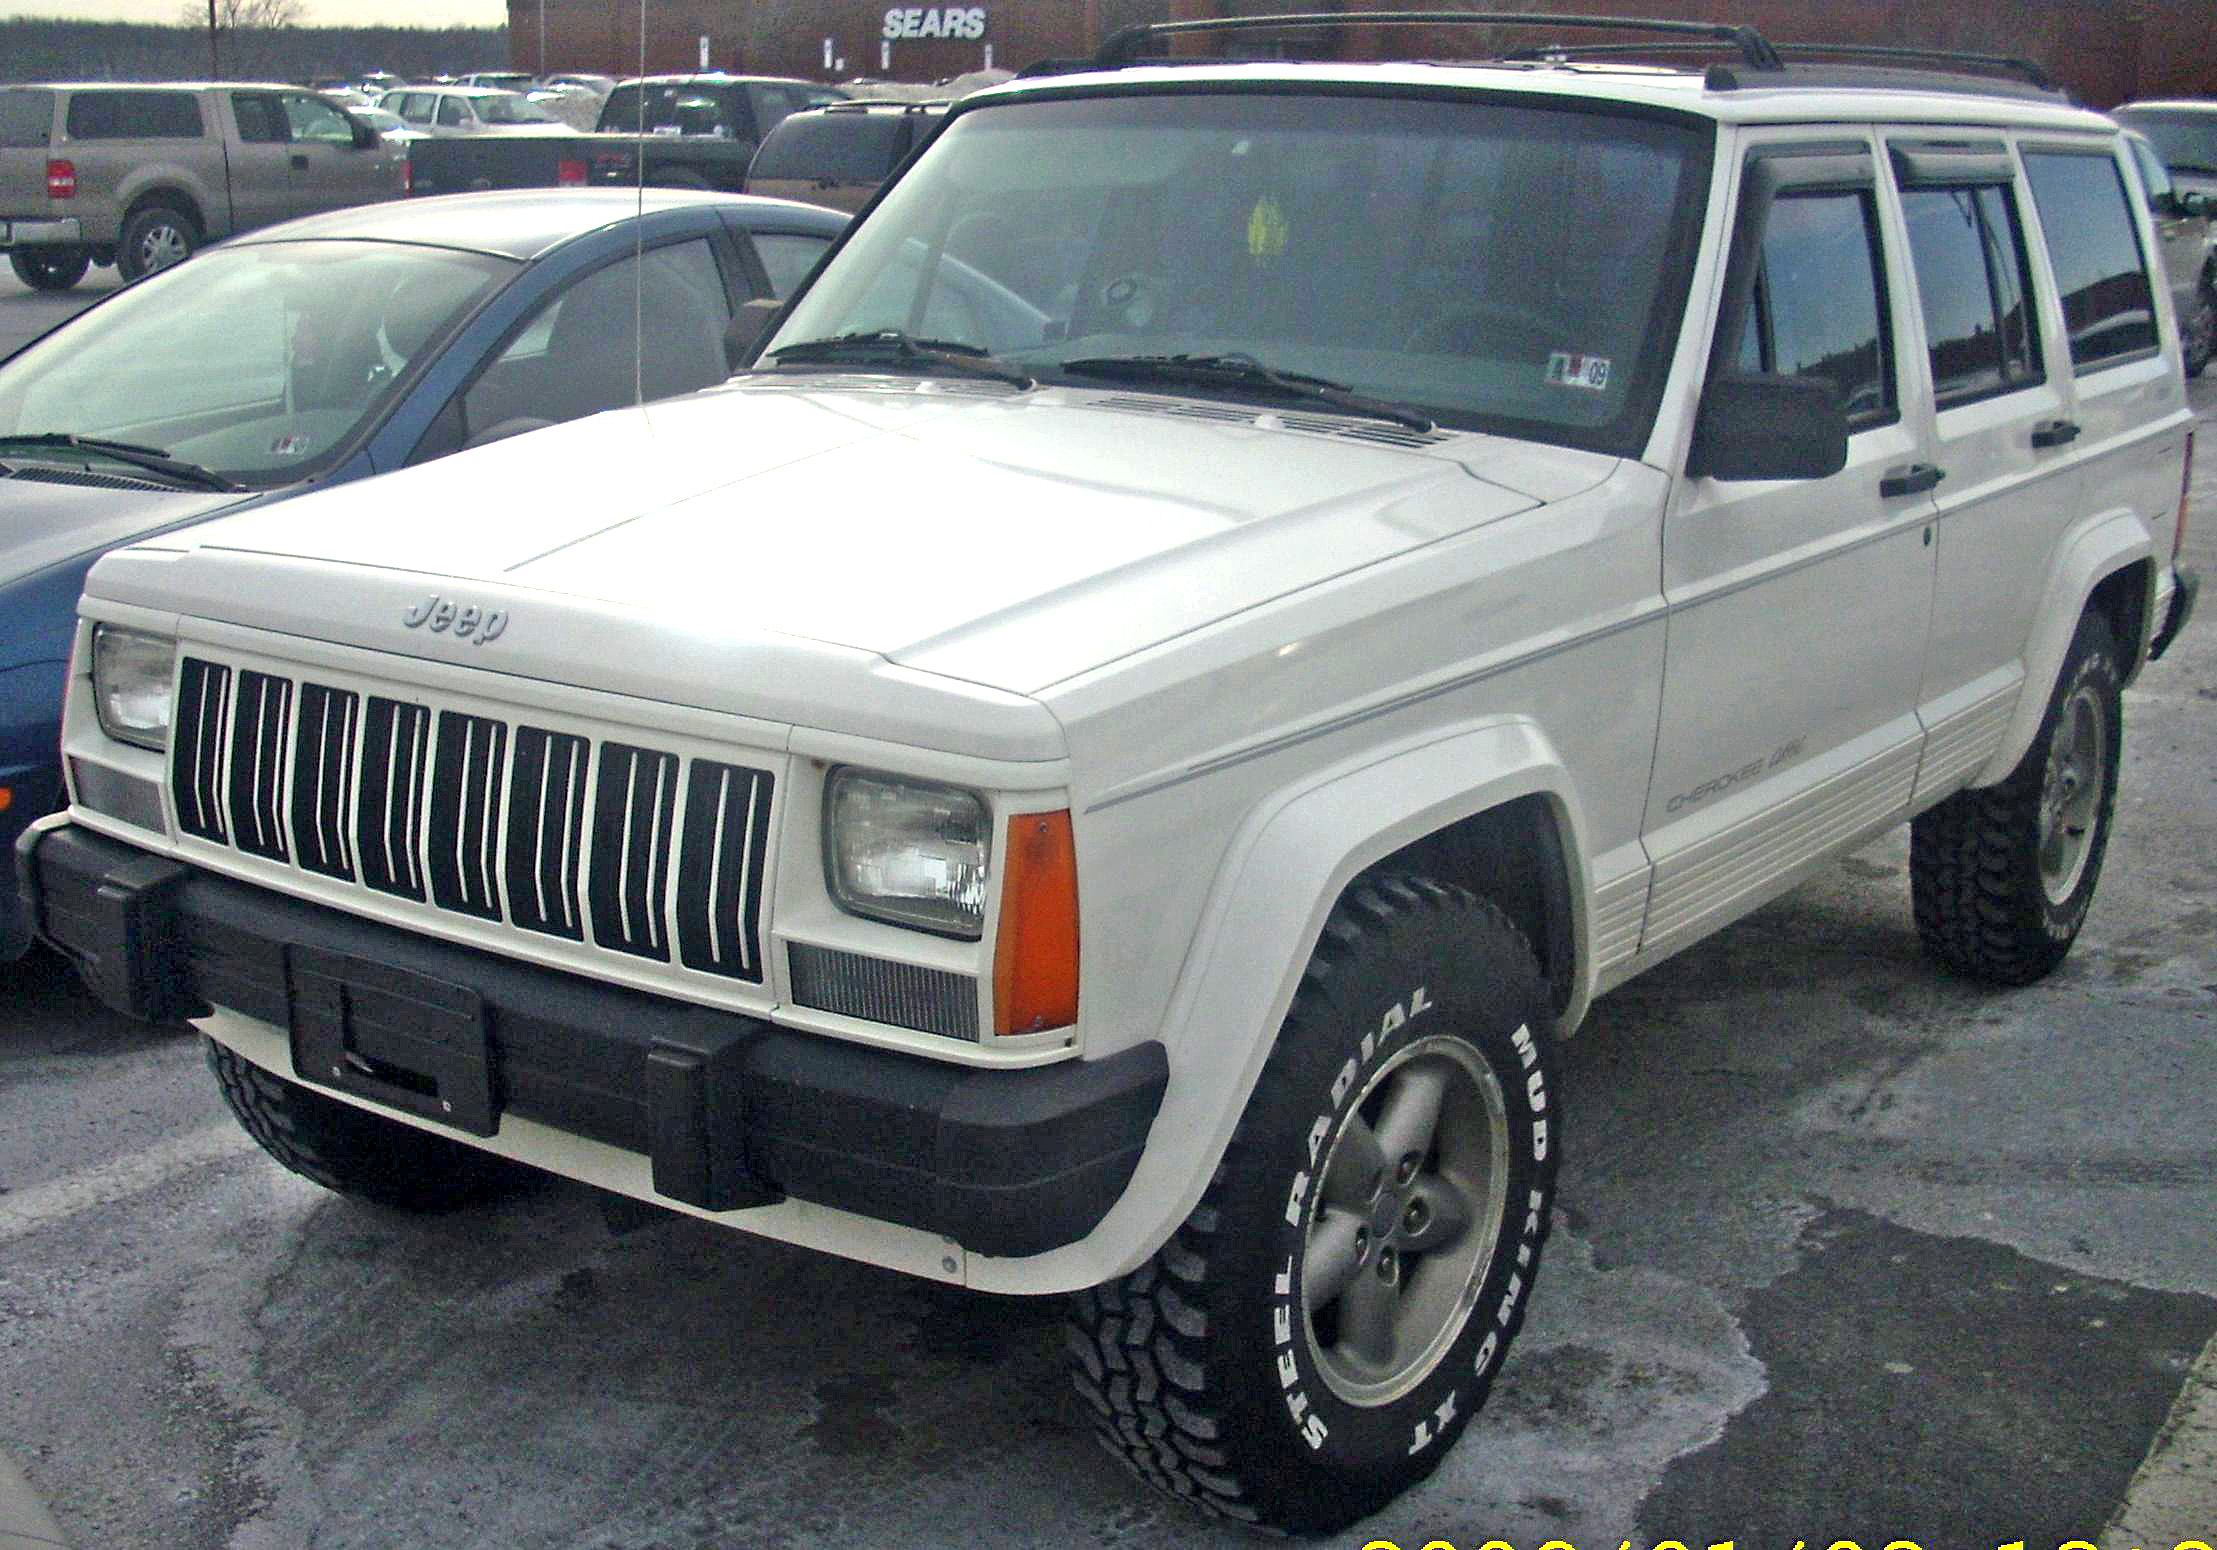 Cherokee Xj For Sale >> File:Jeep Cherokee Classic (XJ).JPG - Wikimedia Commons